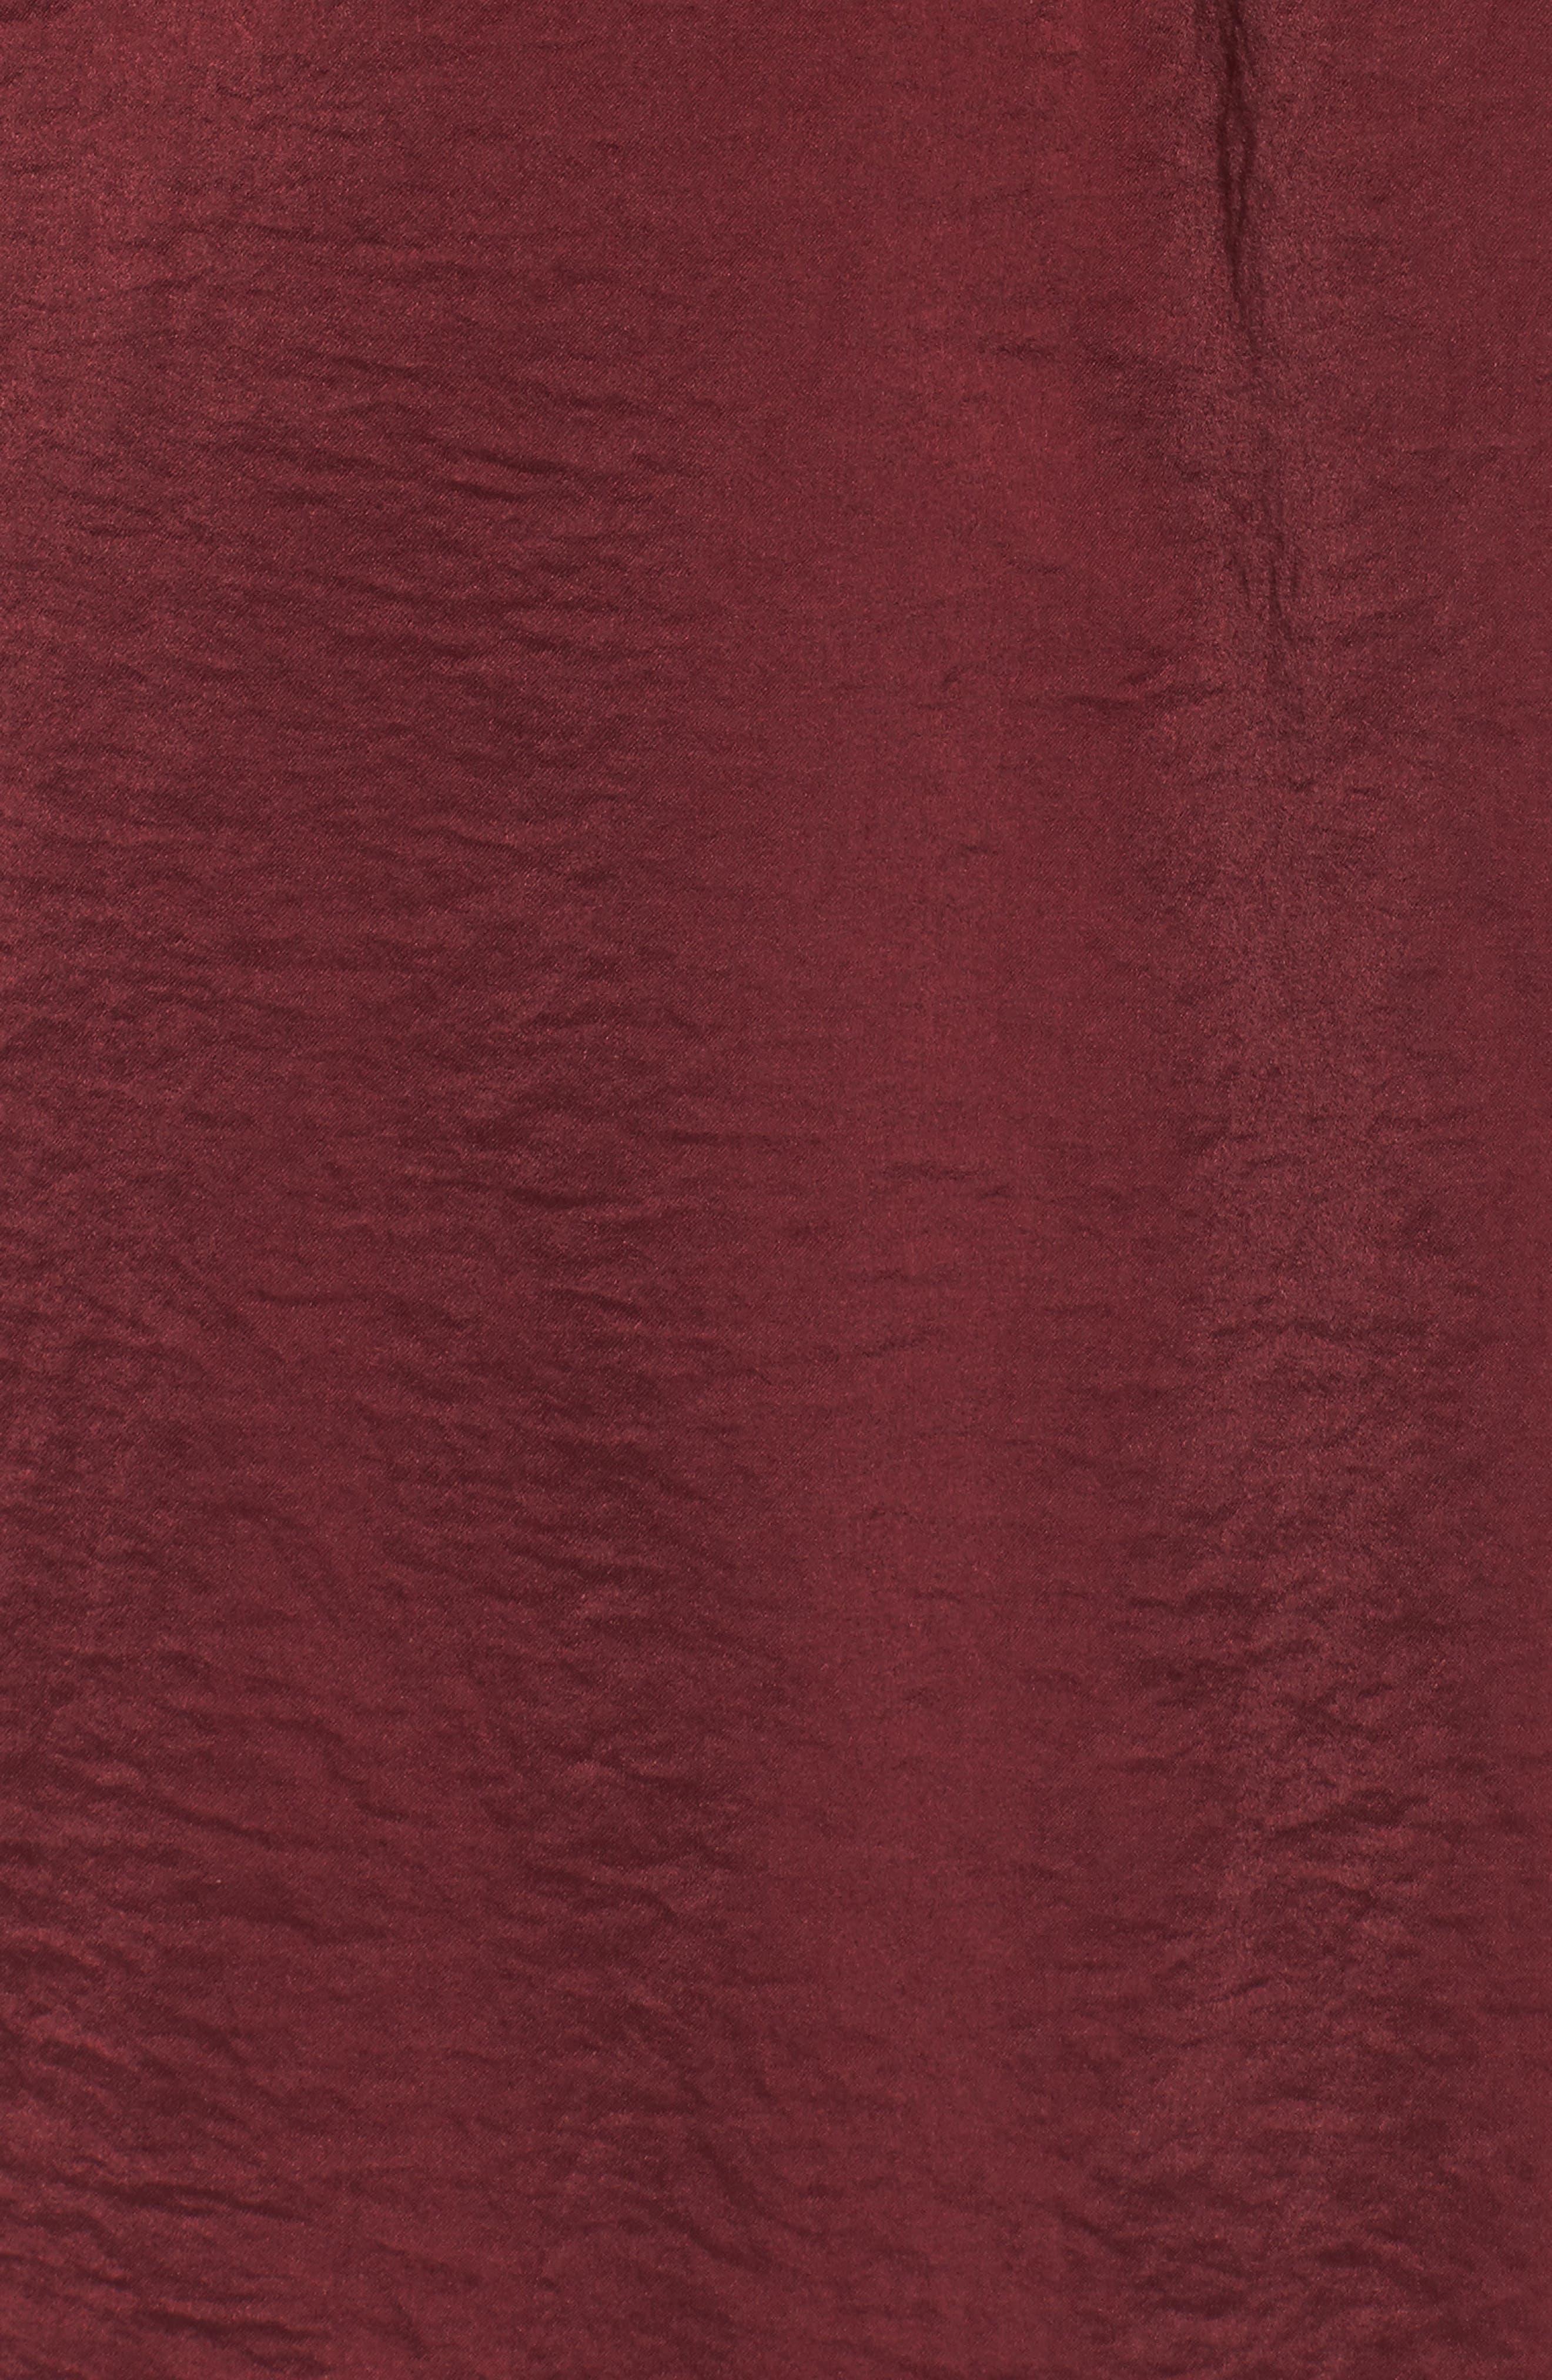 As You Wish Tie Waist Dress,                             Alternate thumbnail 5, color,                             Wine